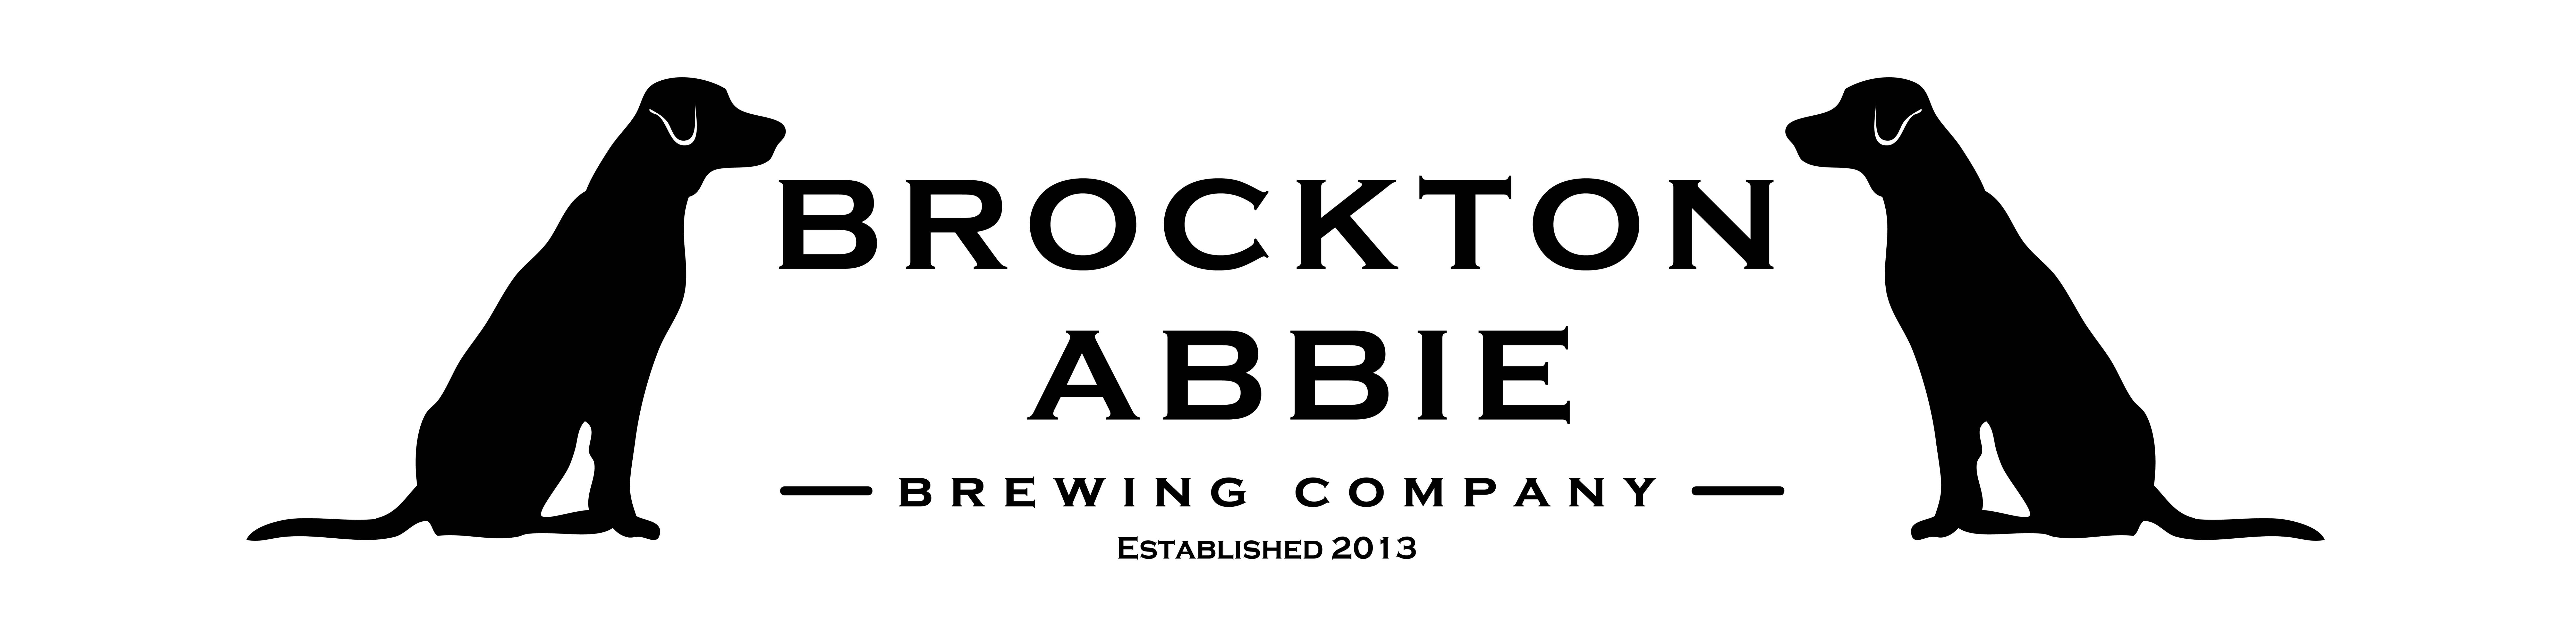 Brockton Abbie Brewing Company   Teespring